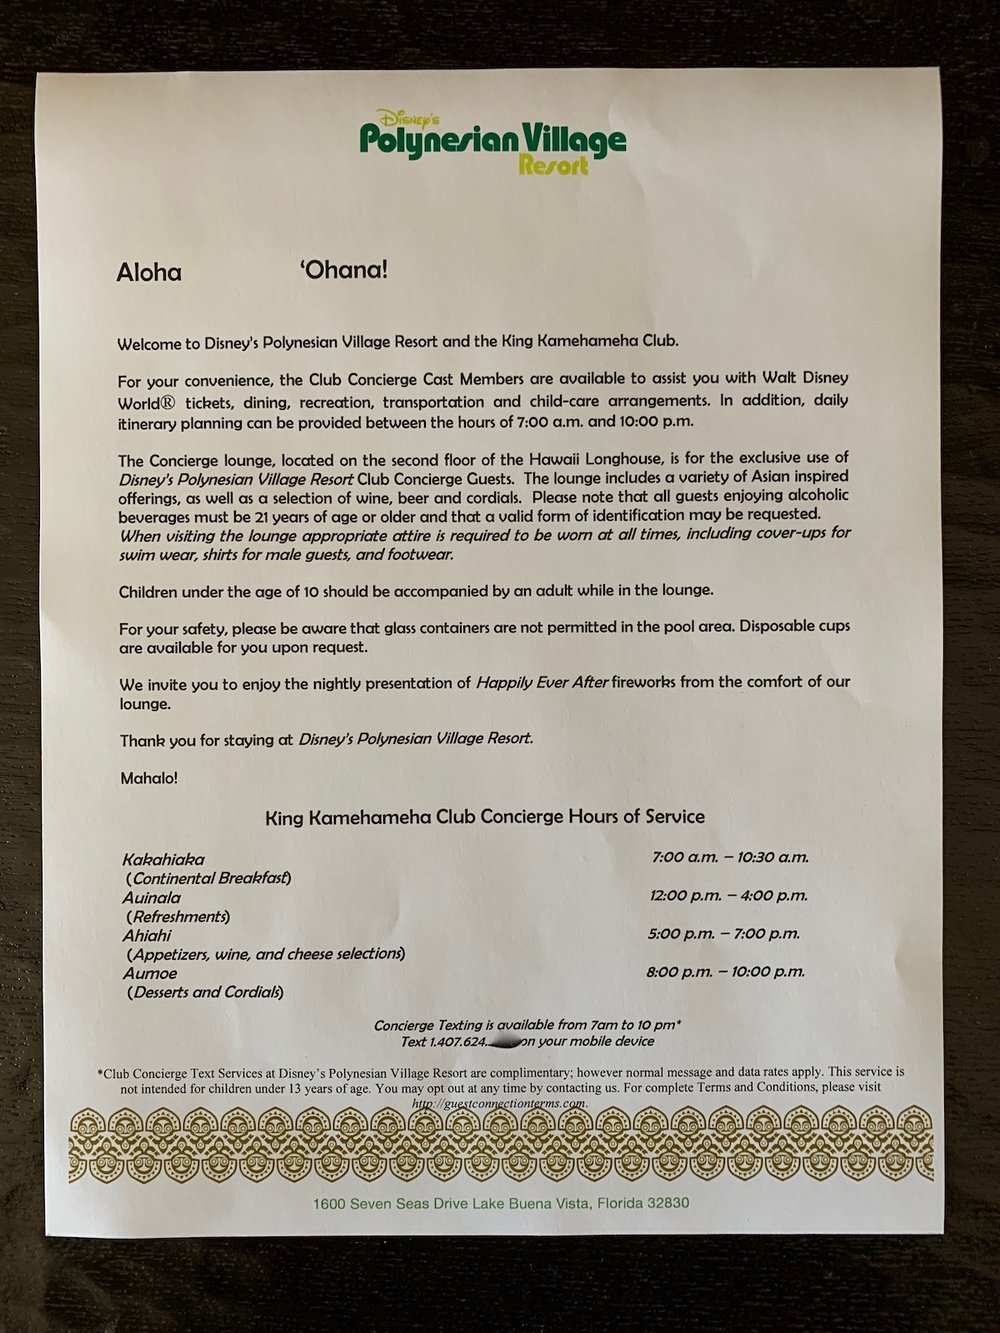 disney polynesian village king kamehameha club level review letter.jpeg